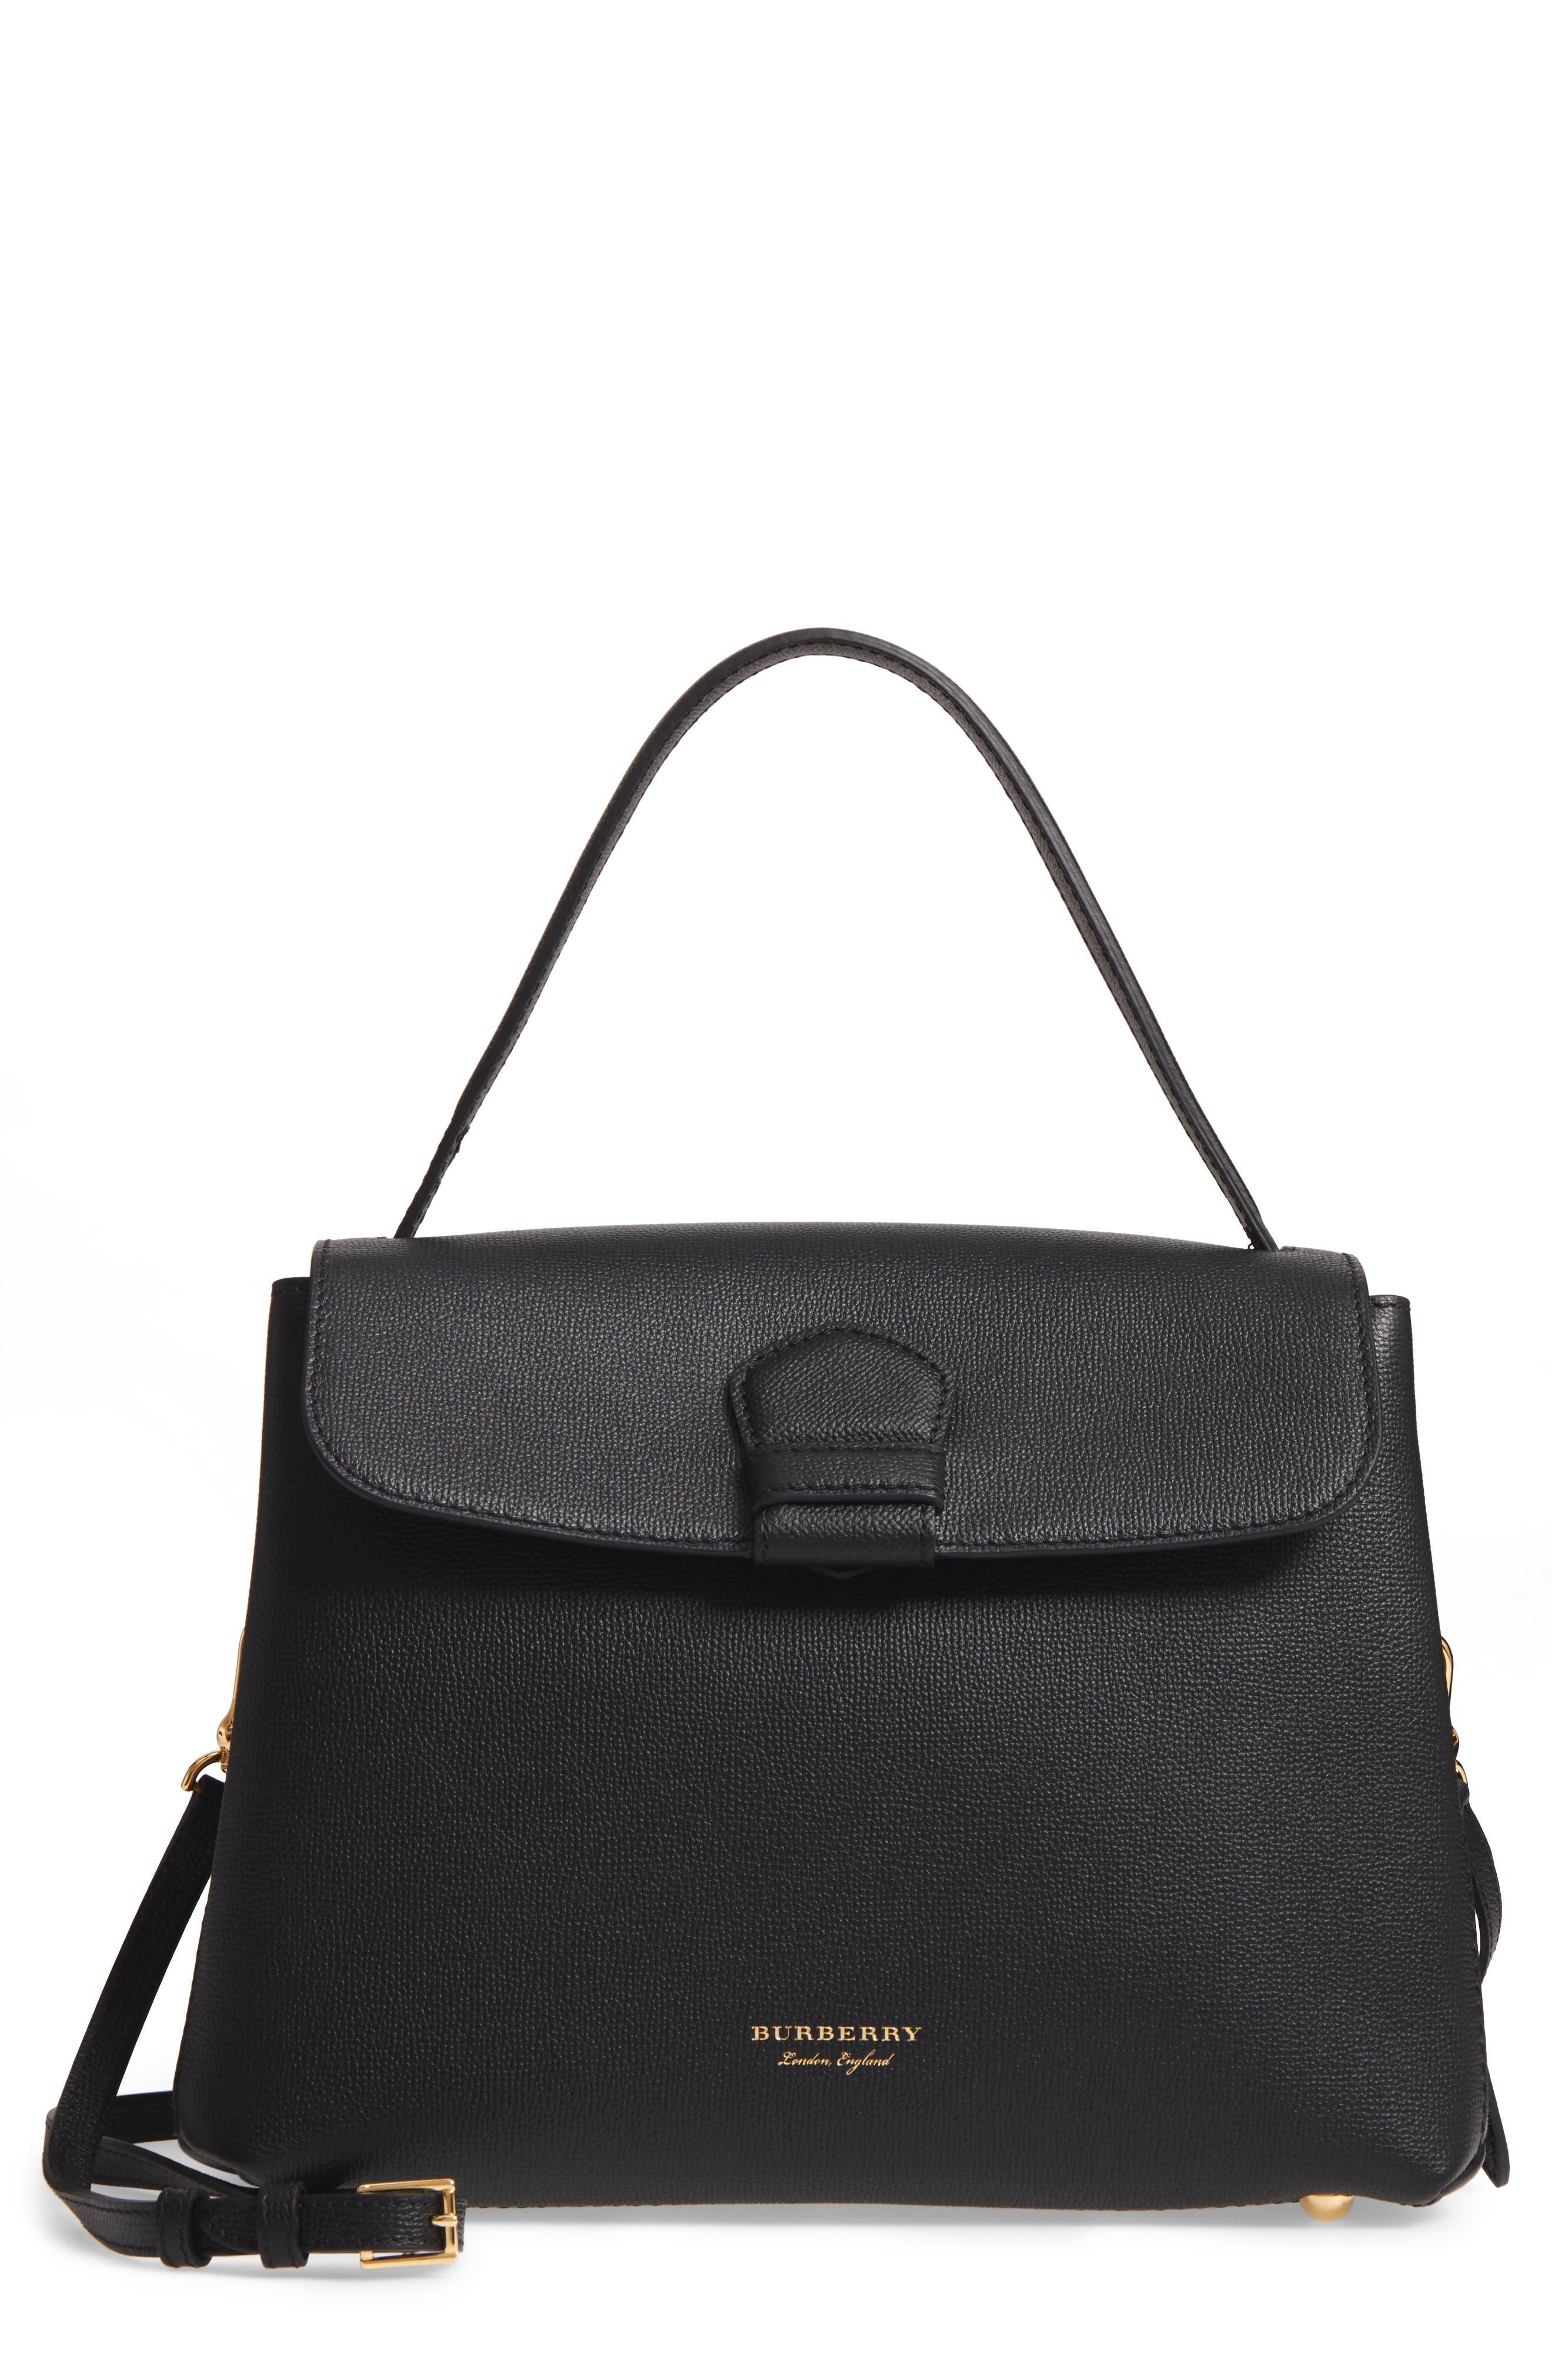 Burberry Women s Handbags, Purses   Wallets   Nordstrom c1600c9b7d4